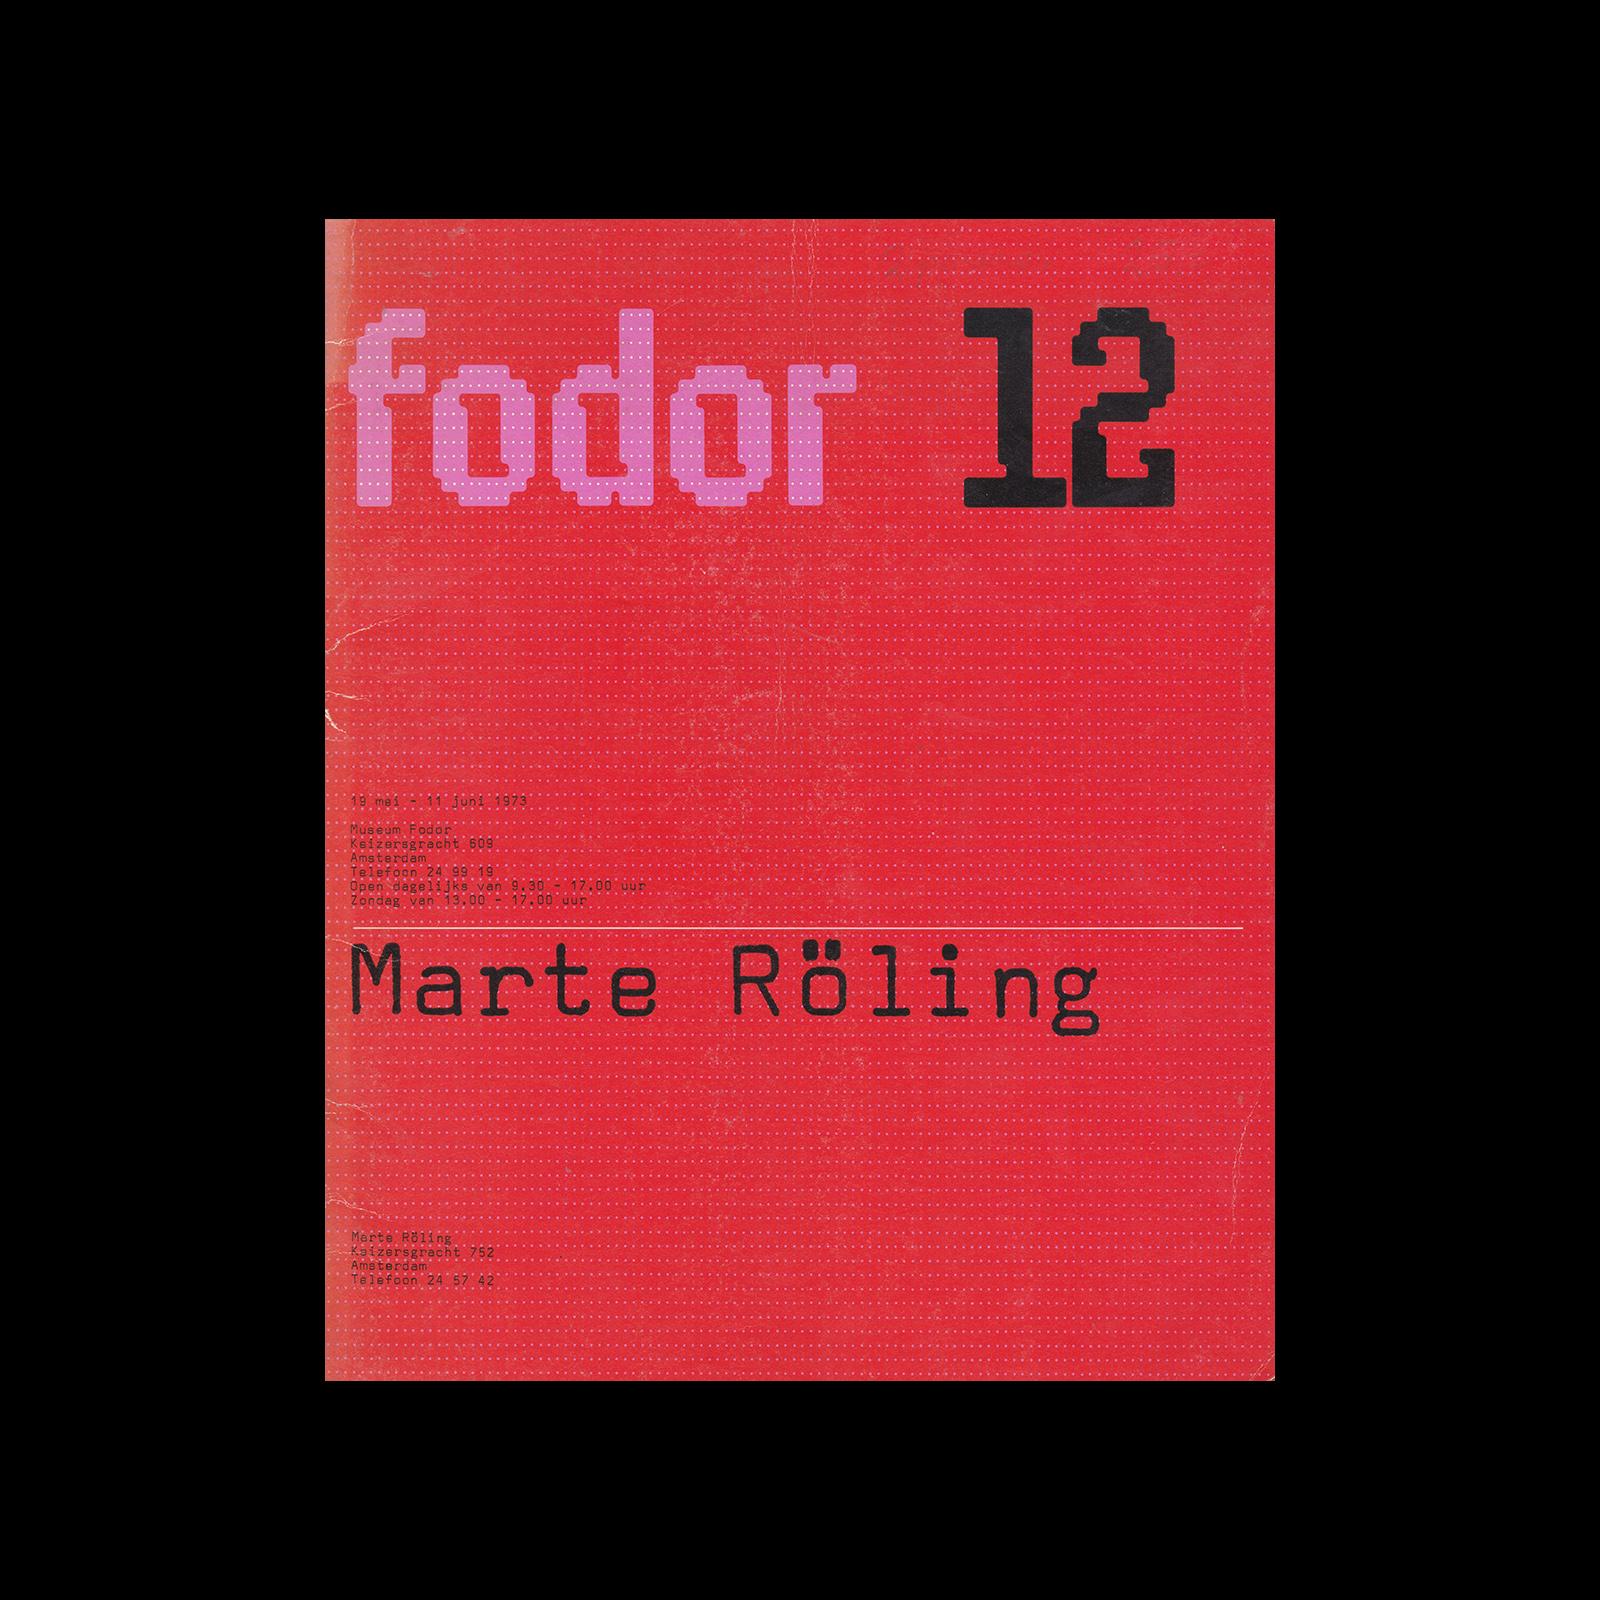 Fodor 12, 1973 - Marte Roling. Designed by Wim Crouwel and Dapne Duijvelshoff (Total Design).